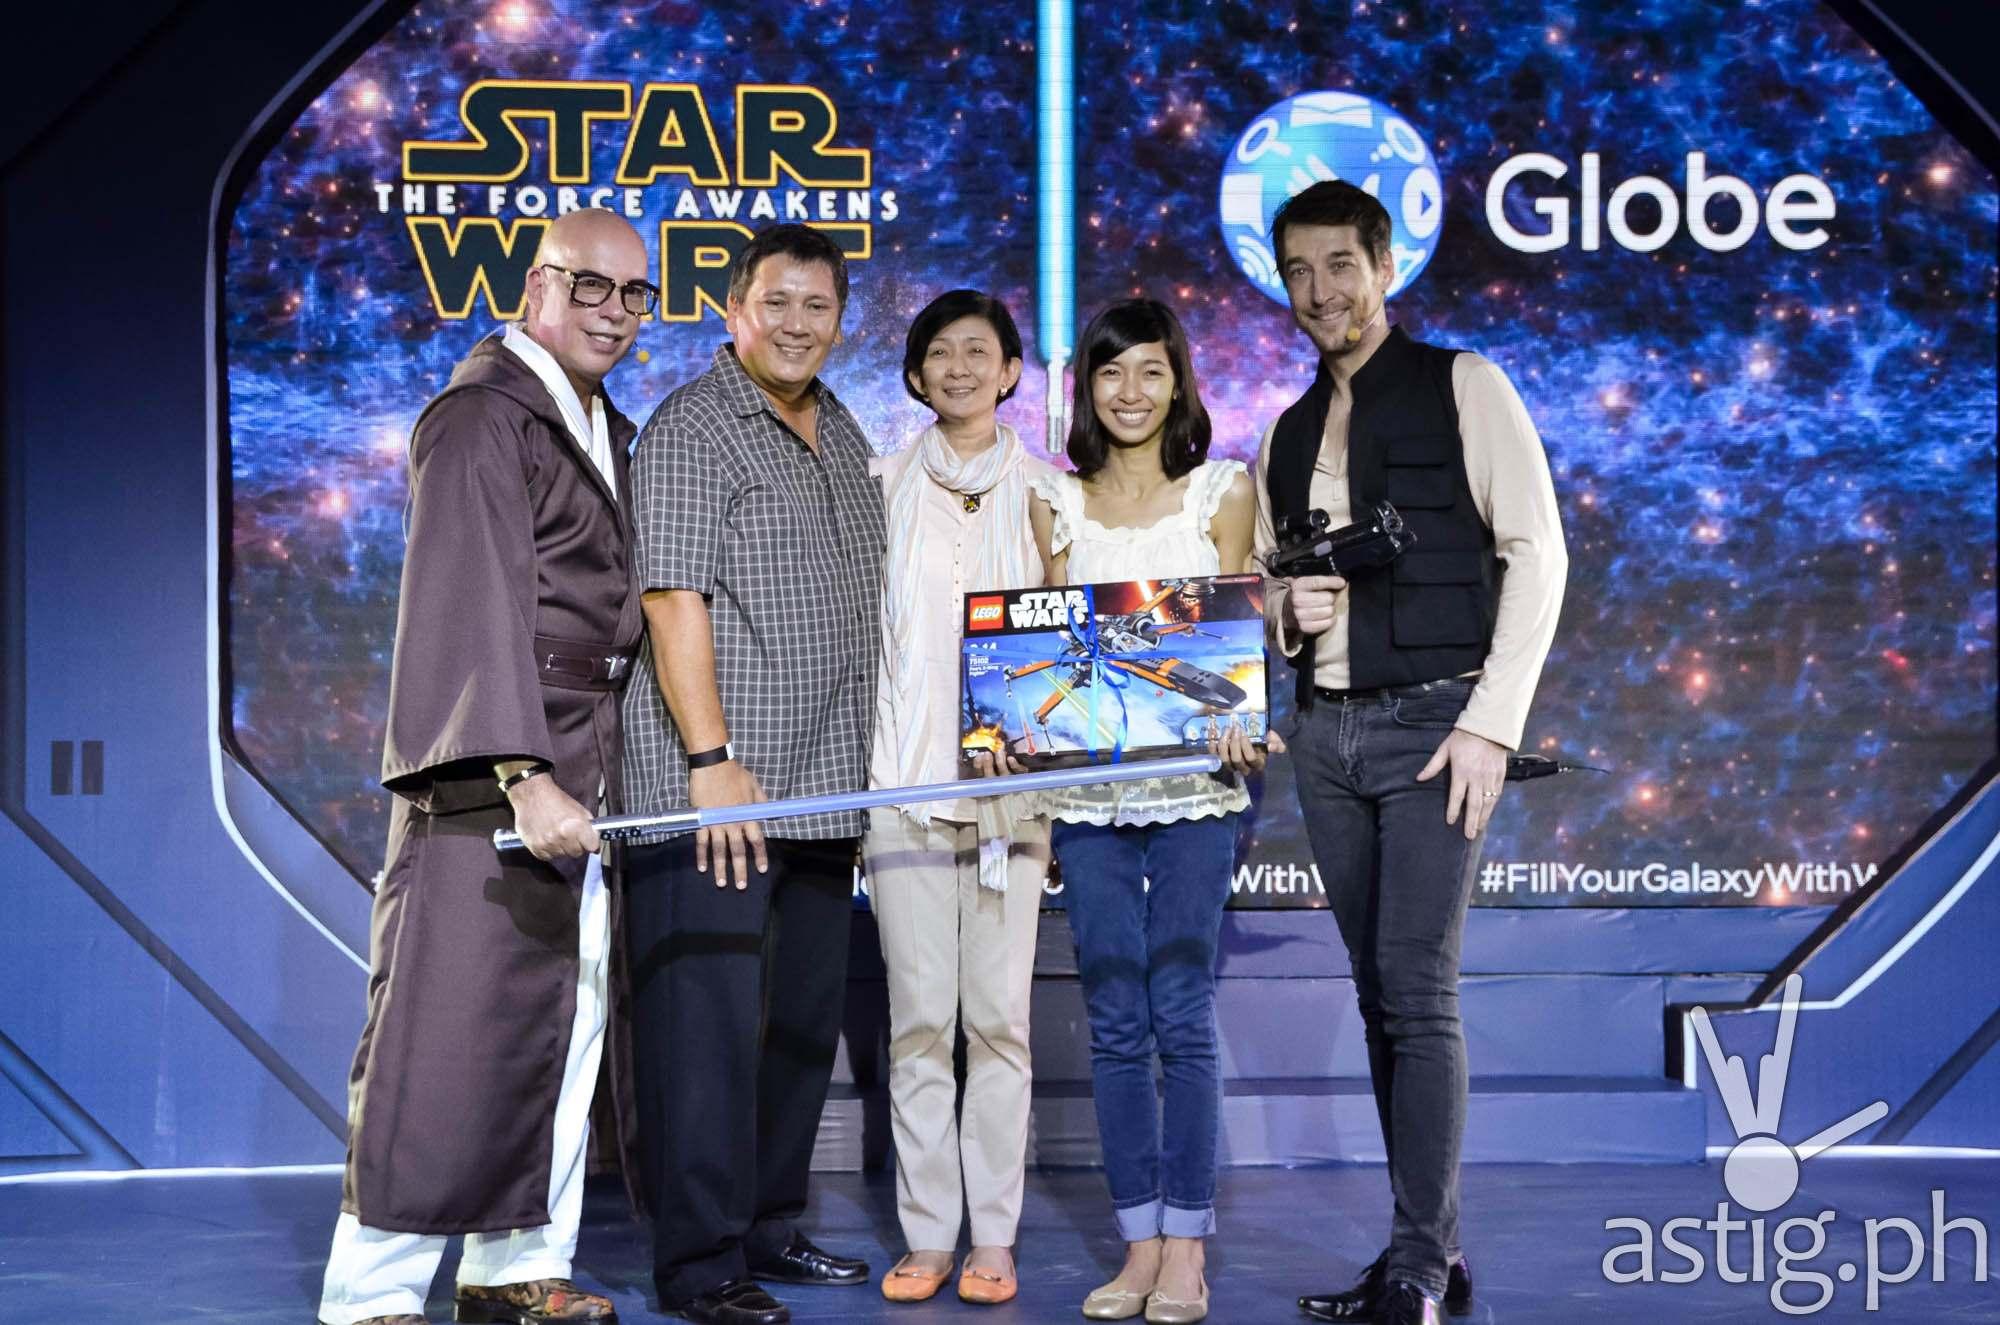 PH's 1st 1Gbps broadband plan customer is powered by Globe Telecom